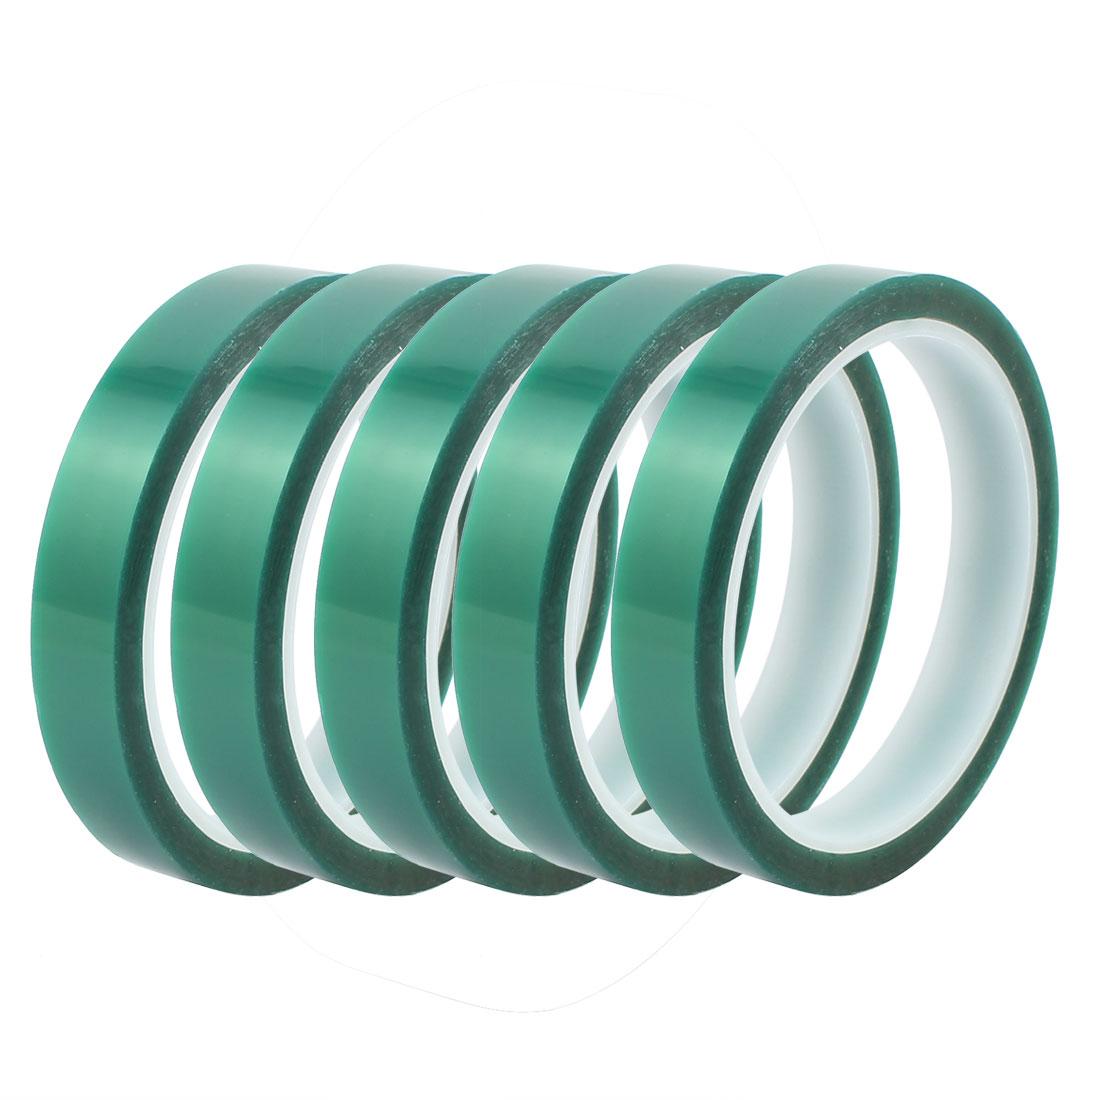 5Pcs 15mm Width 33M Length Green PET Self Adhesive Tape High Temp Heat Resistant